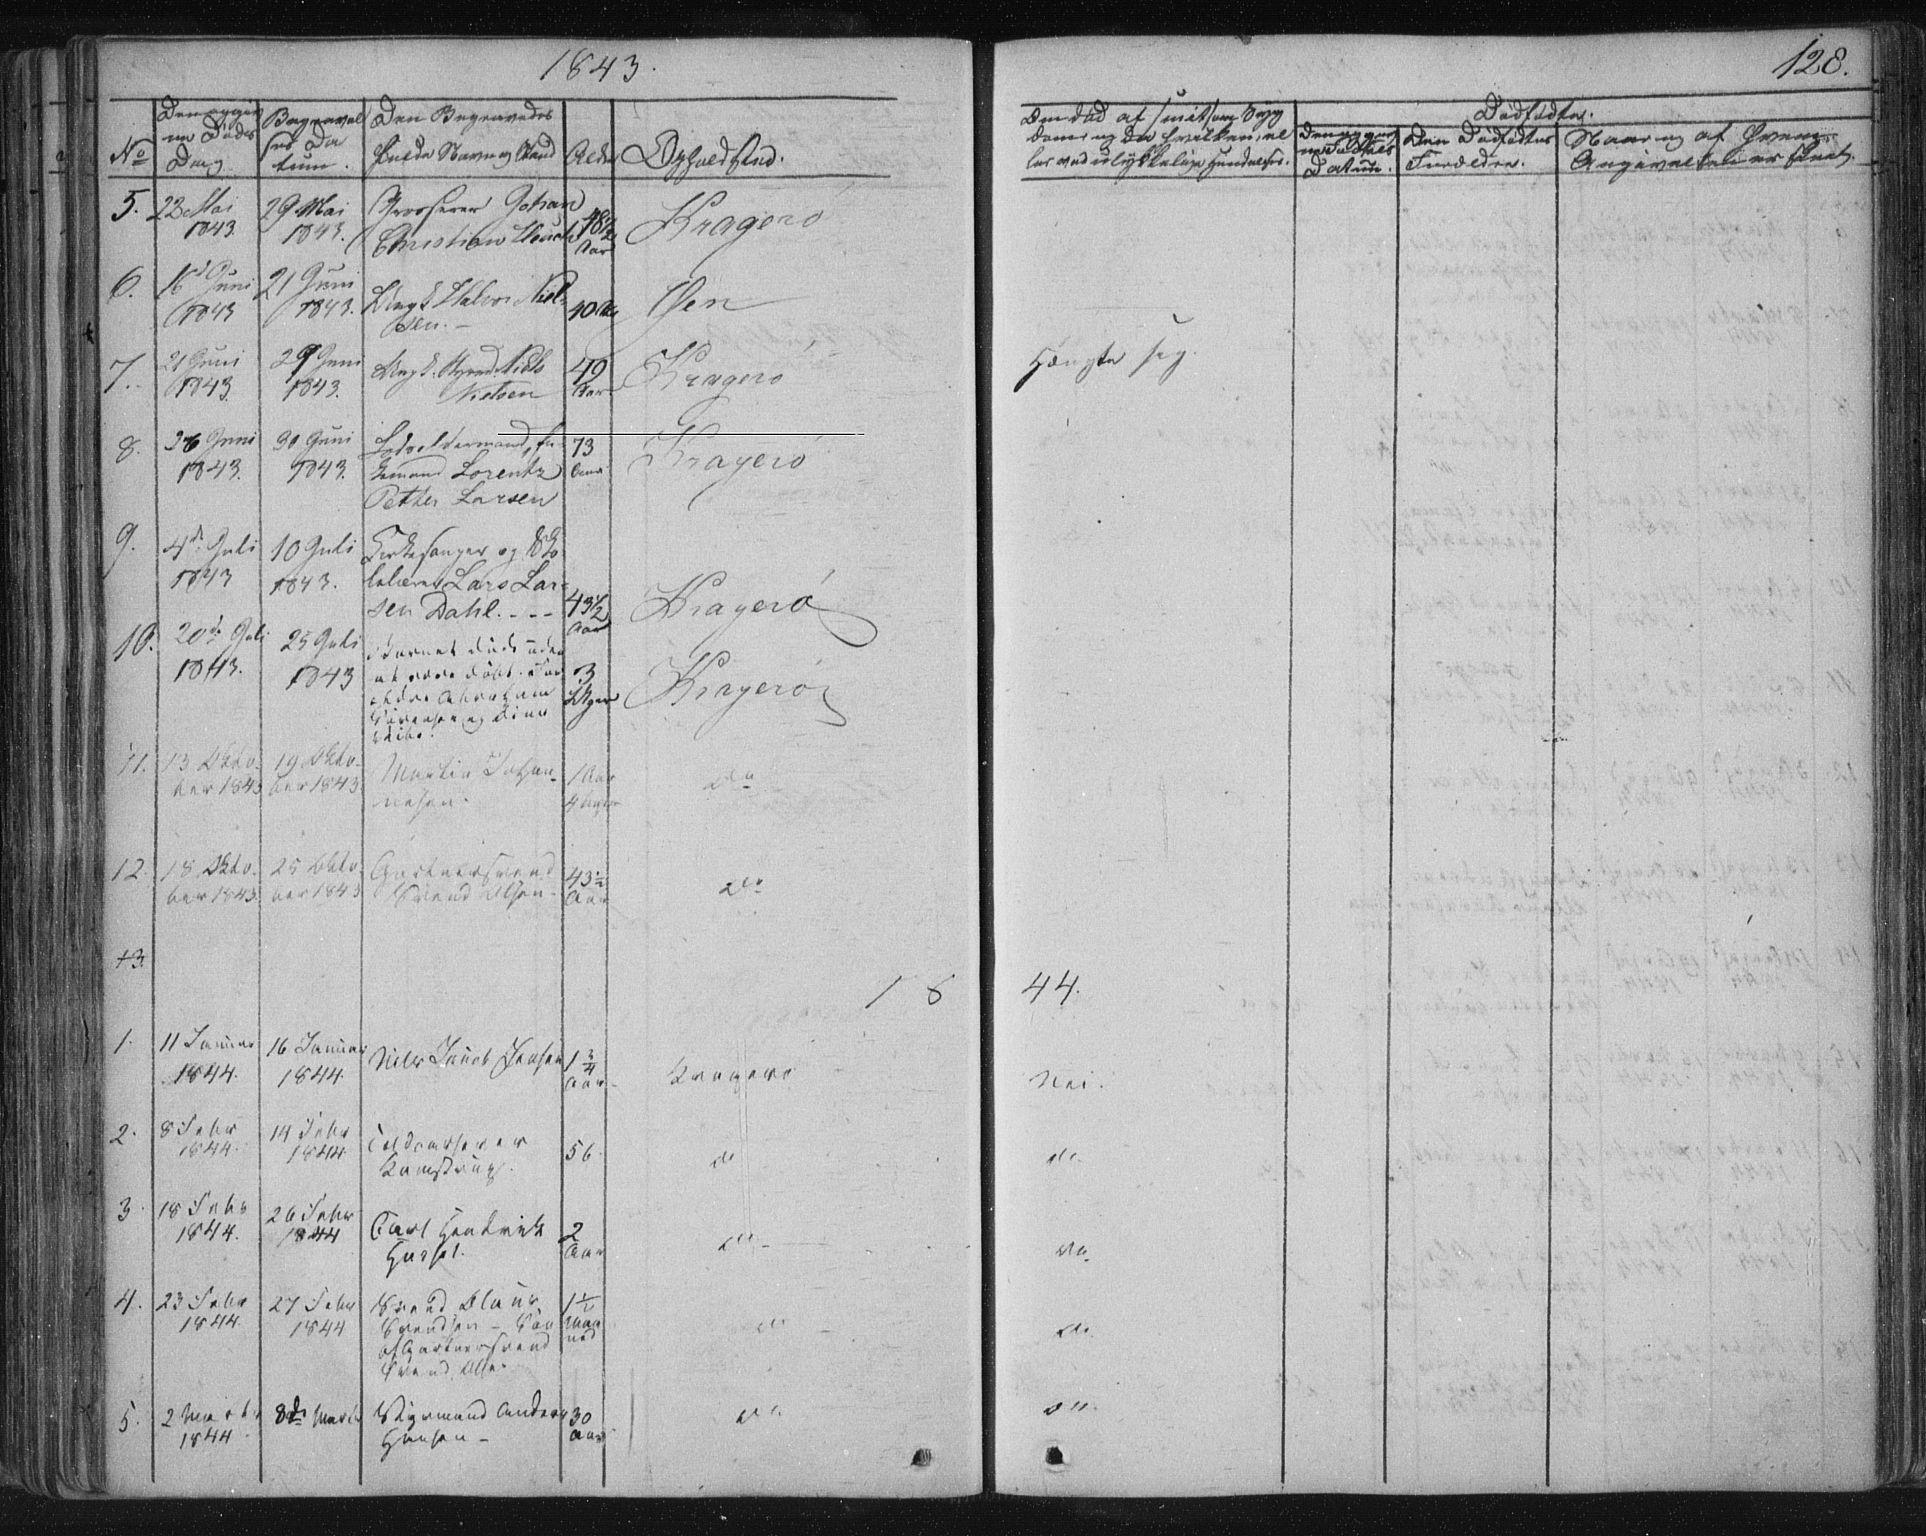 SAKO, Kragerø kirkebøker, F/Fa/L0005: Ministerialbok nr. 5, 1832-1847, s. 128